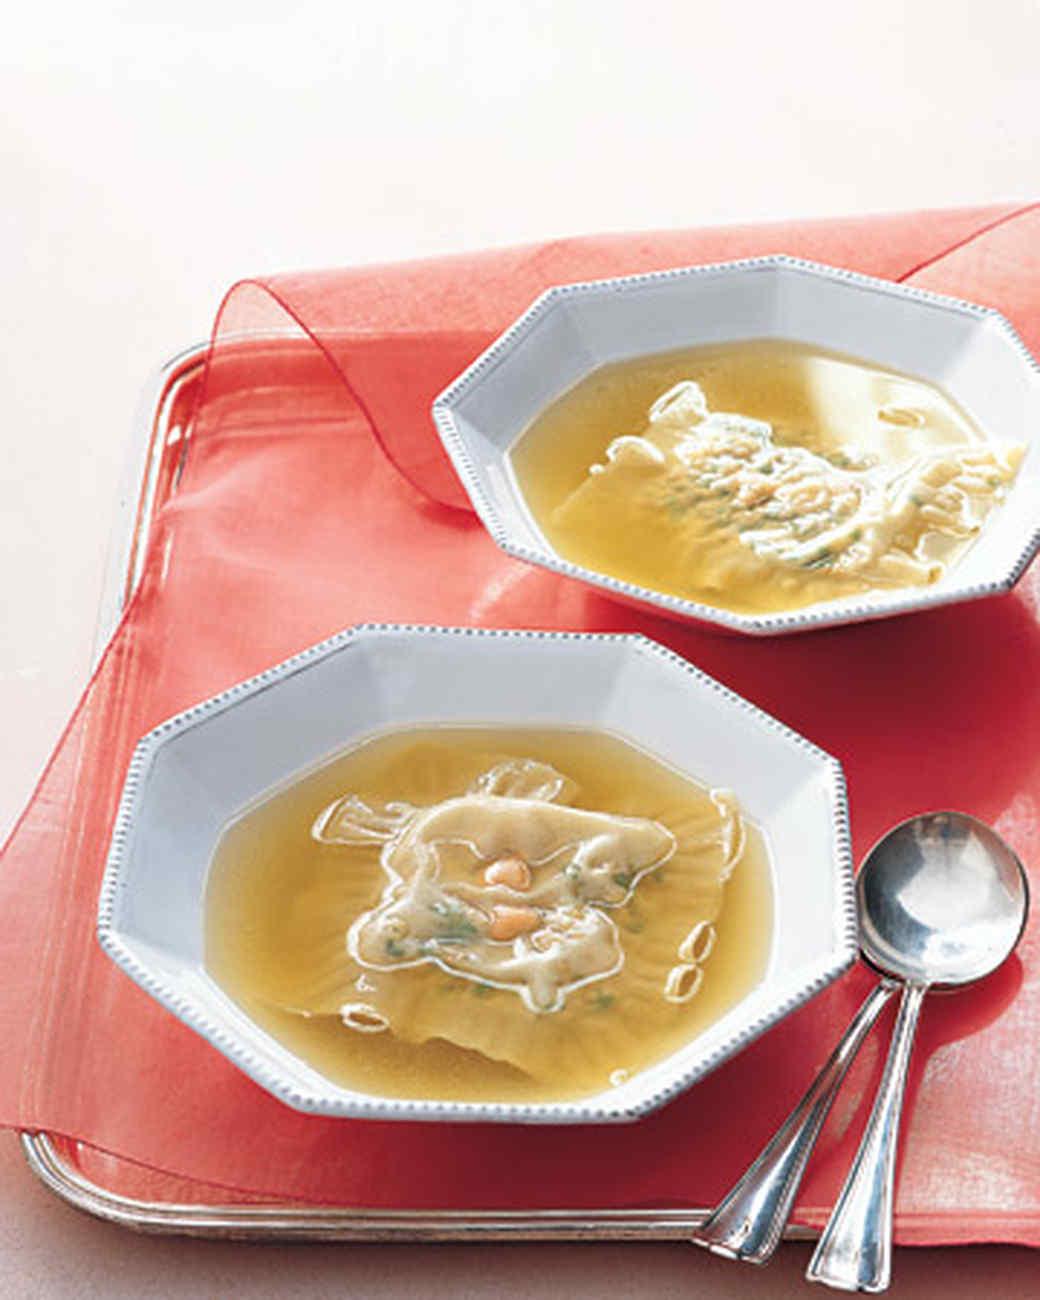 mla102837_0207_soup.jpg